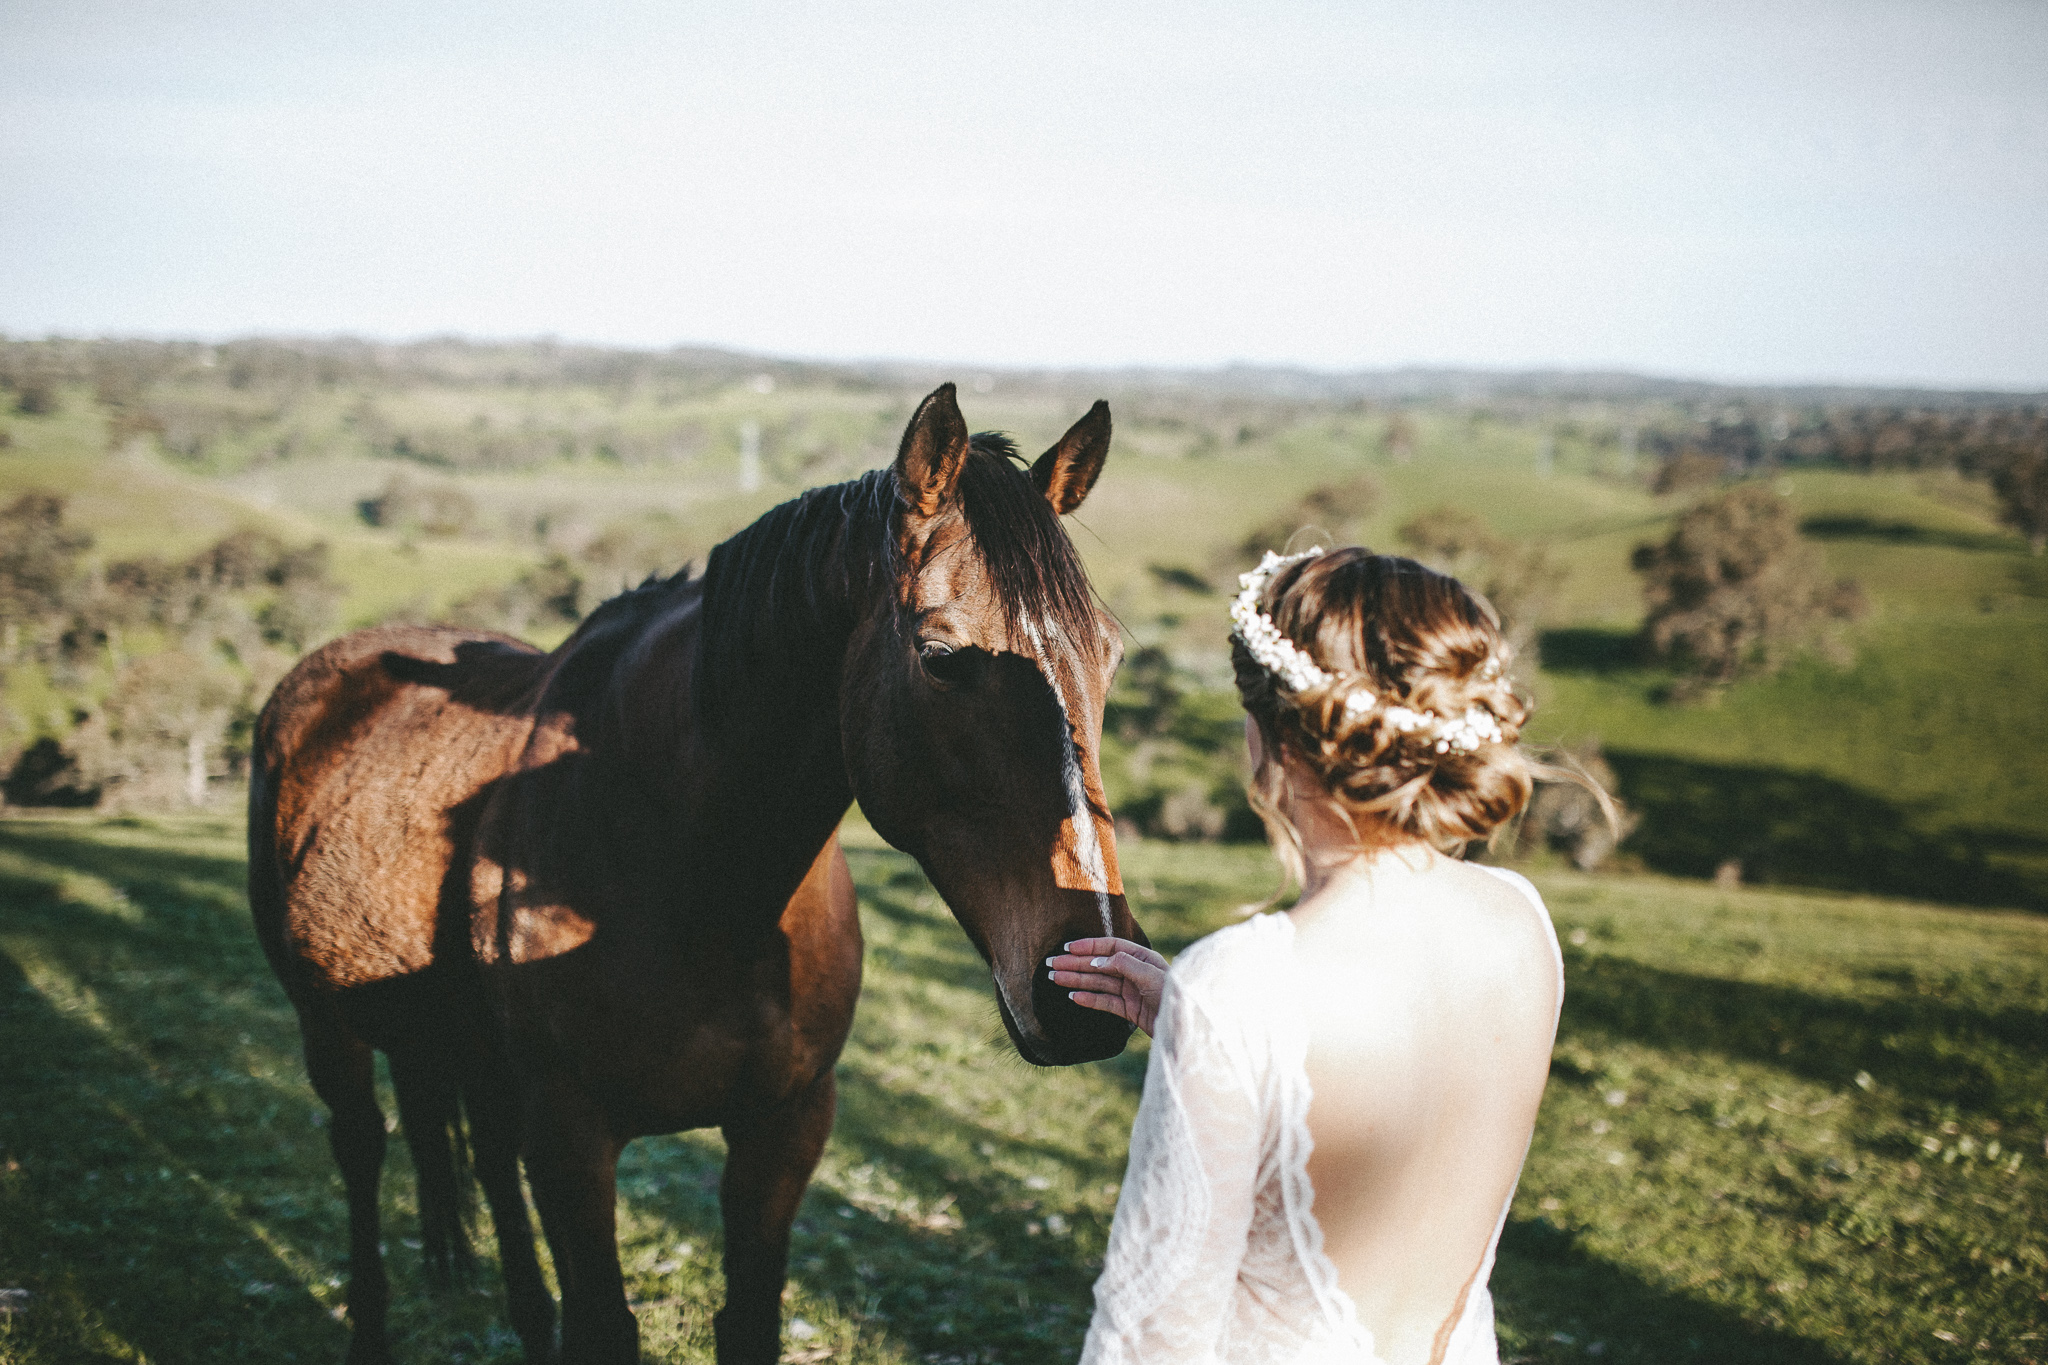 christopher morrison_adelaide hills wedding_ andy + teegan_52_9860.jpg